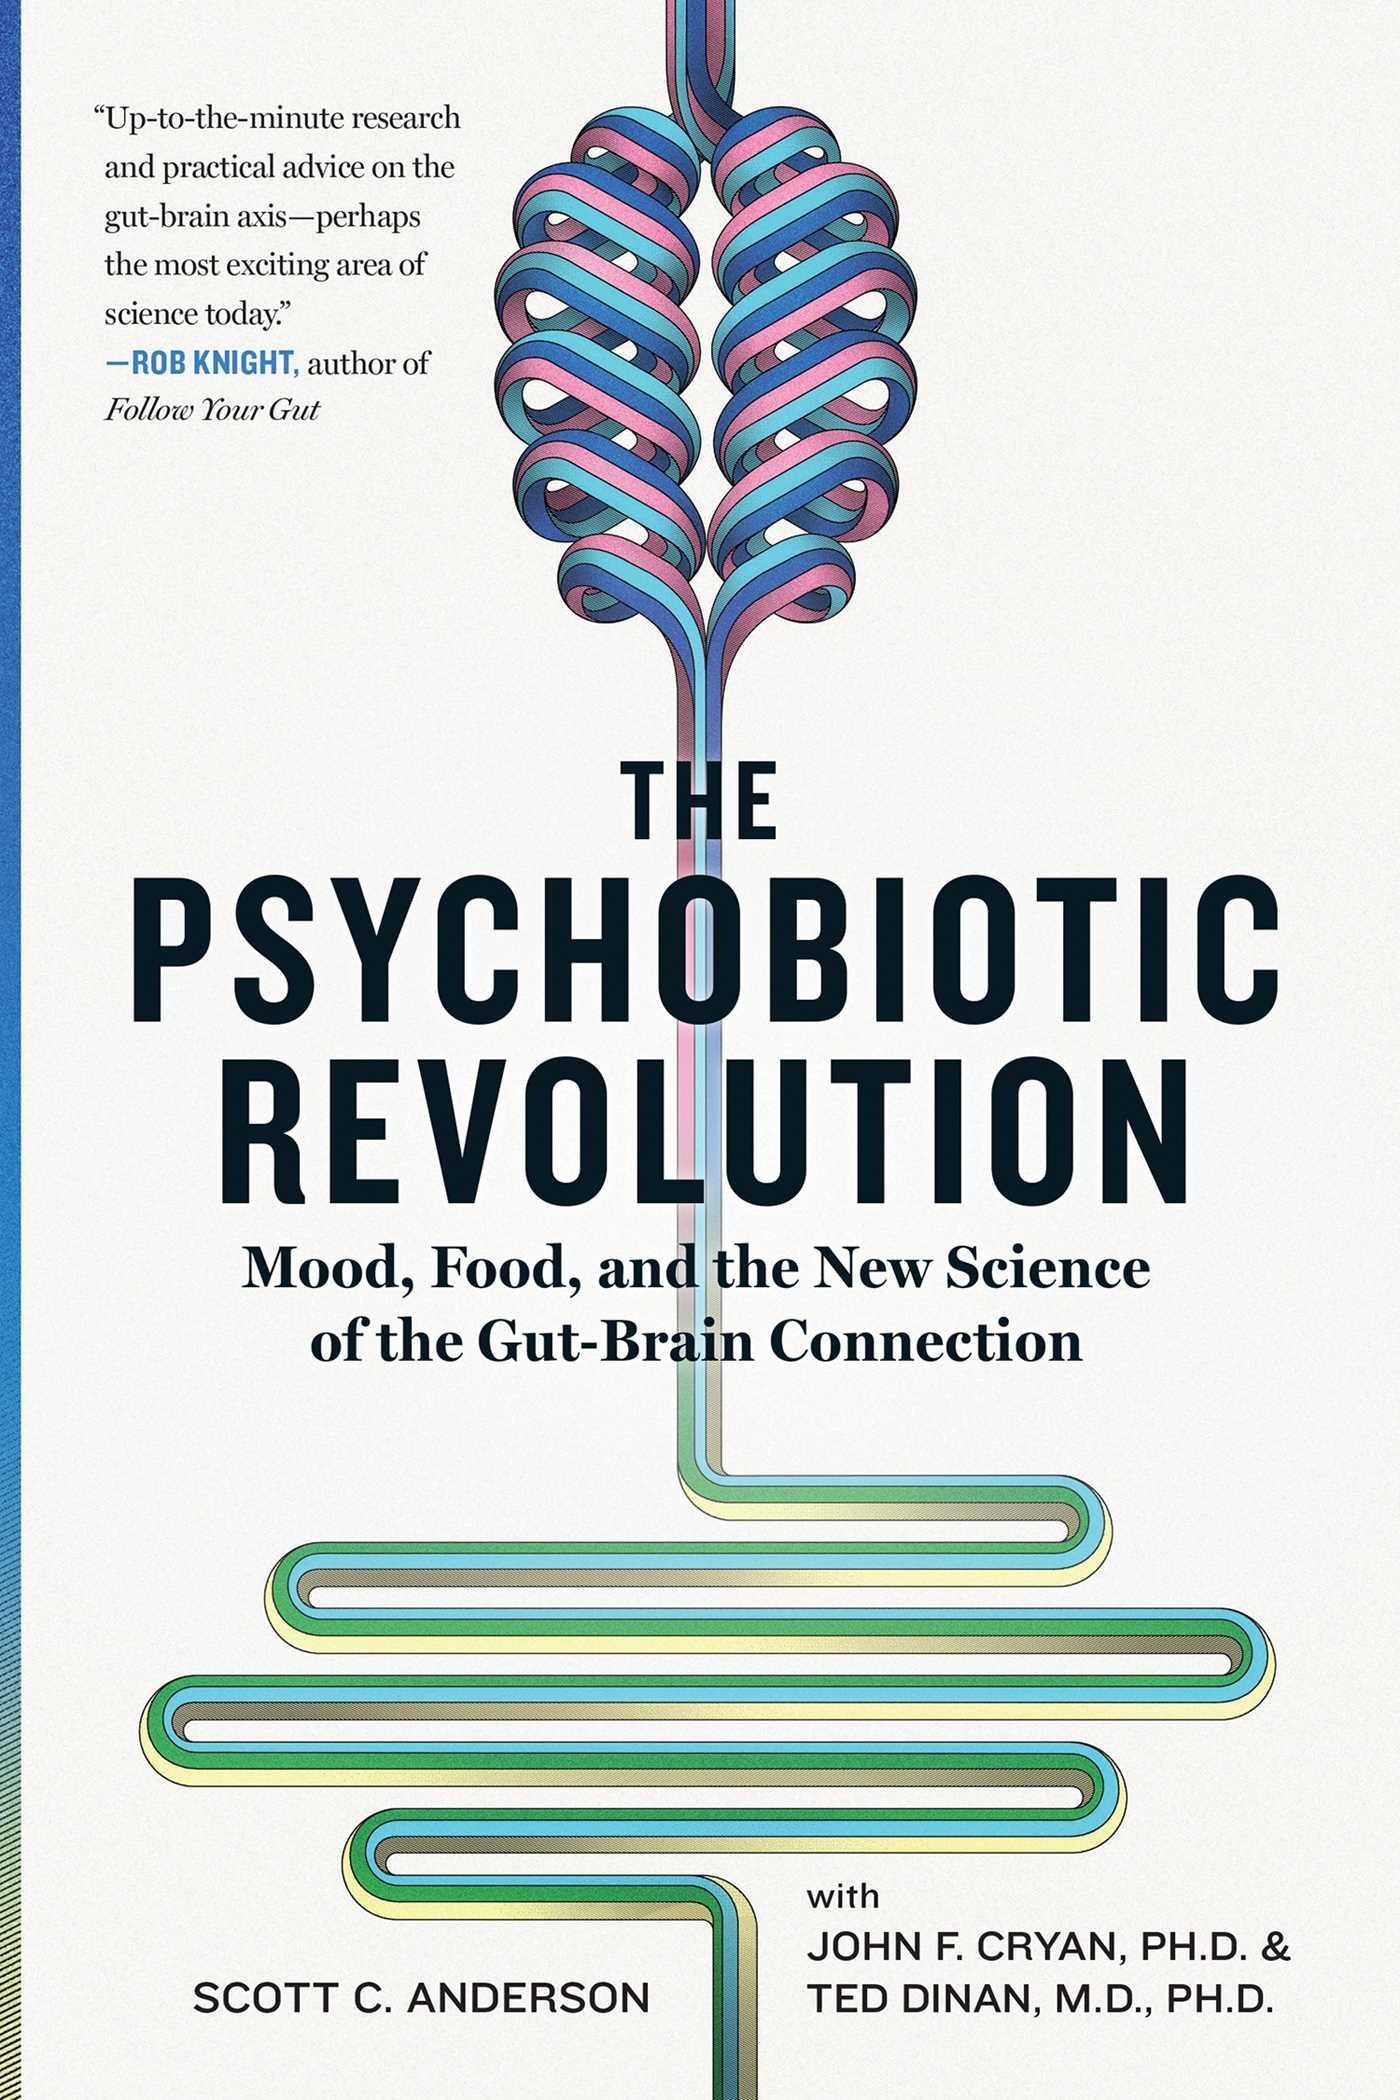 The psychobiotic revolution 9781426218460 hr